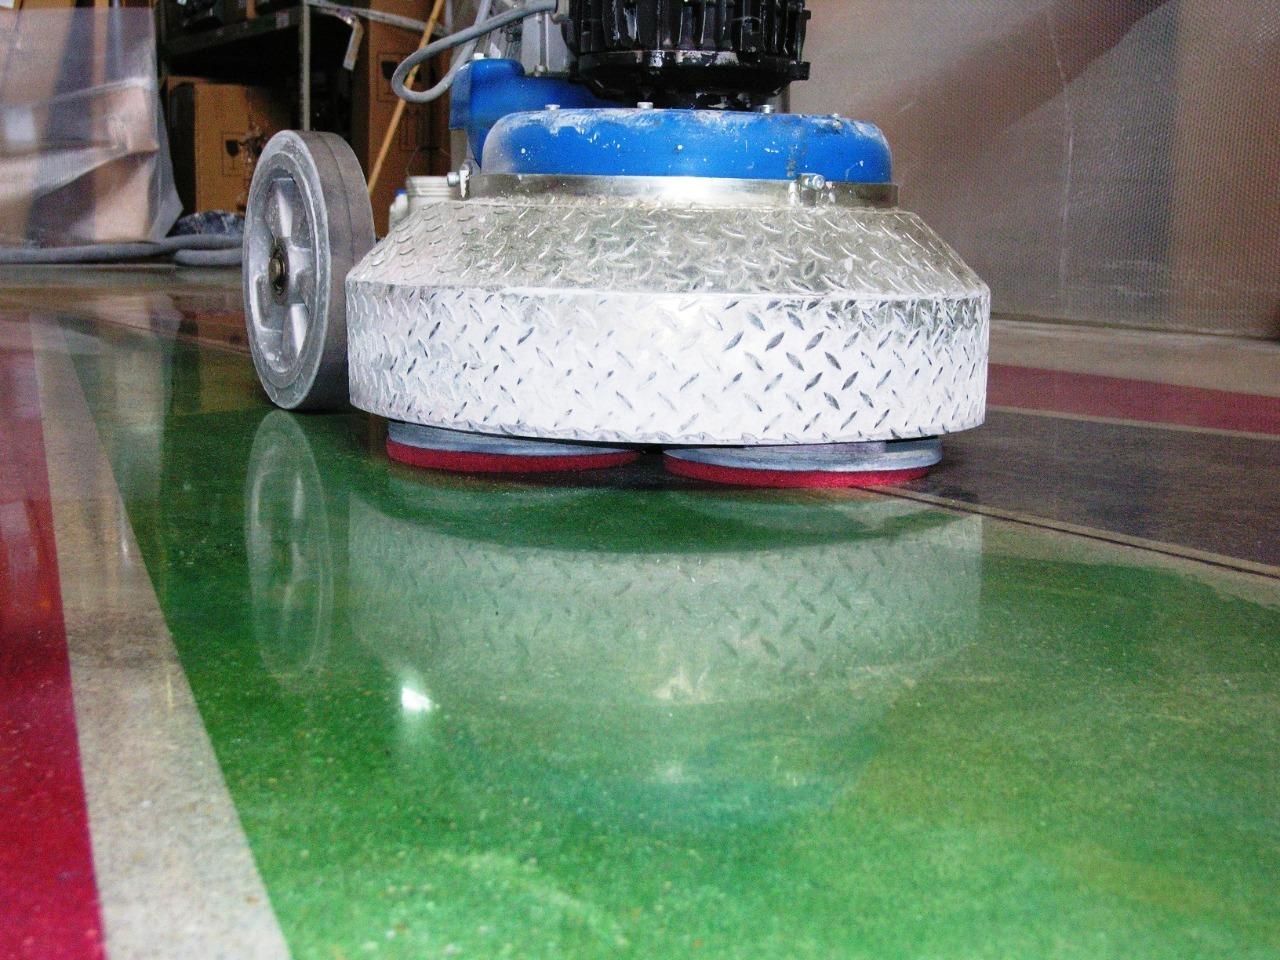 Klindex Concrete Sealer - Beton Guard Lithium